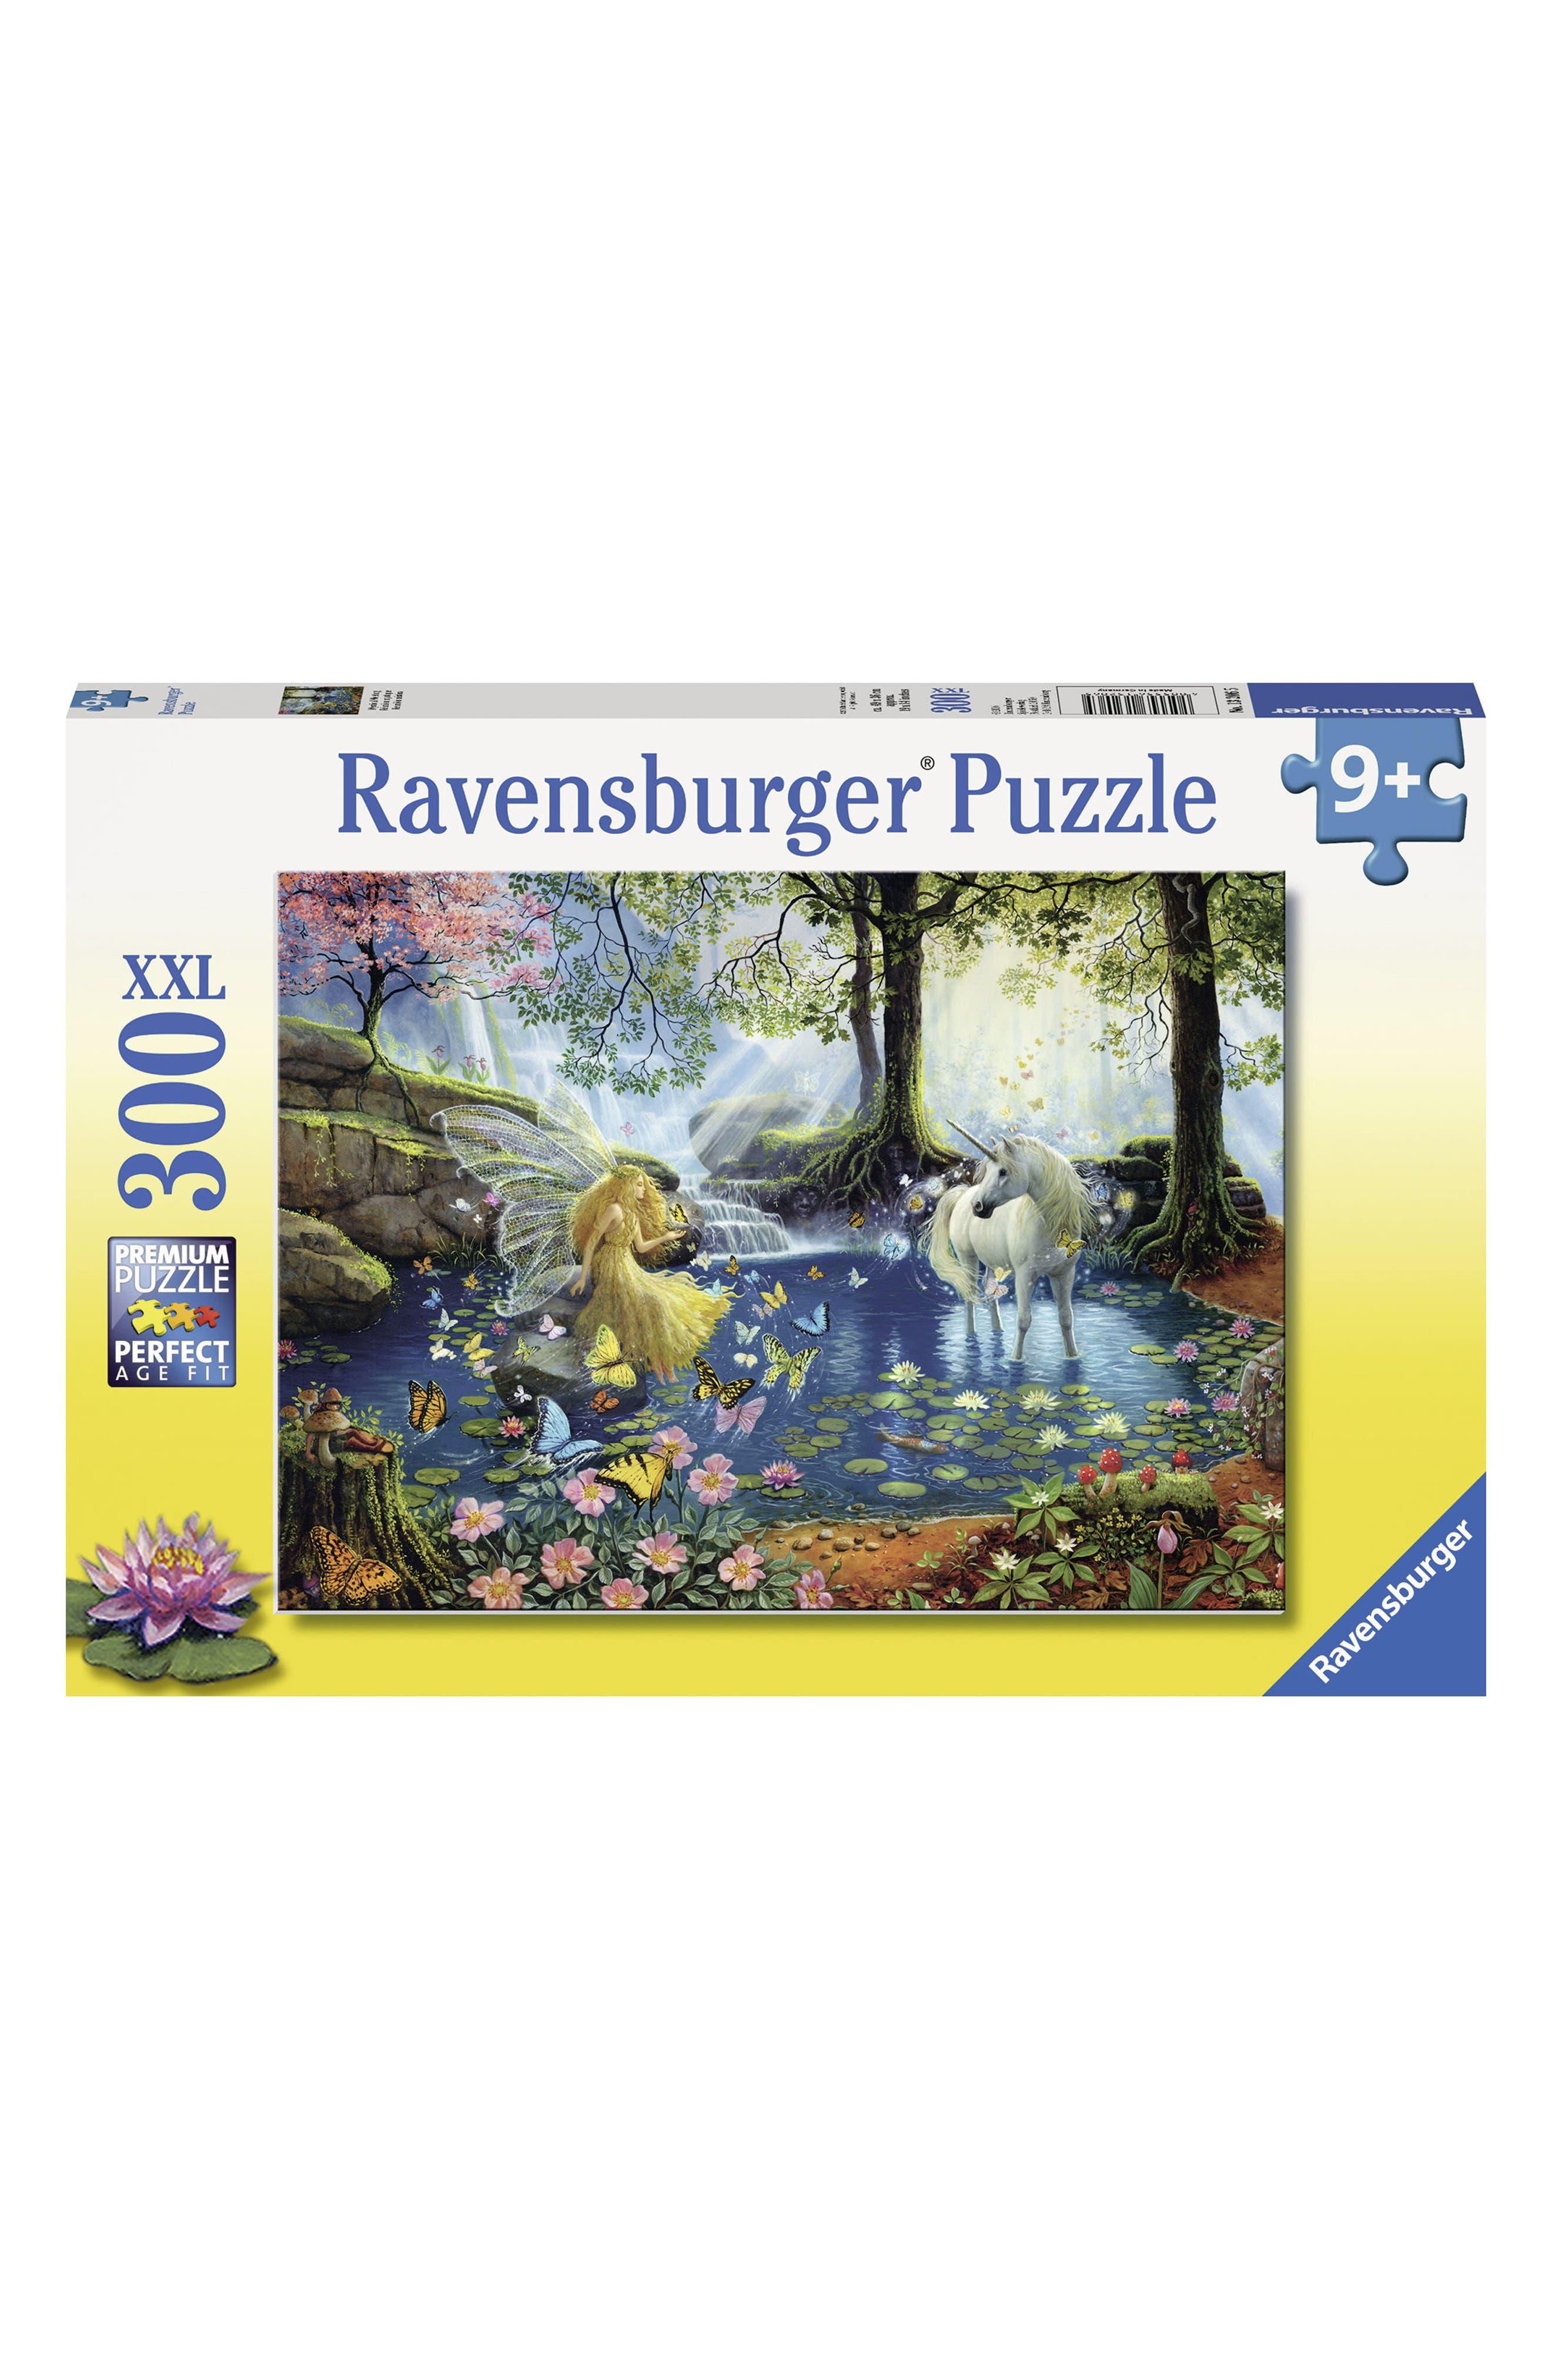 Ravensburger Mystical Meeting 300-Piece Puzzle